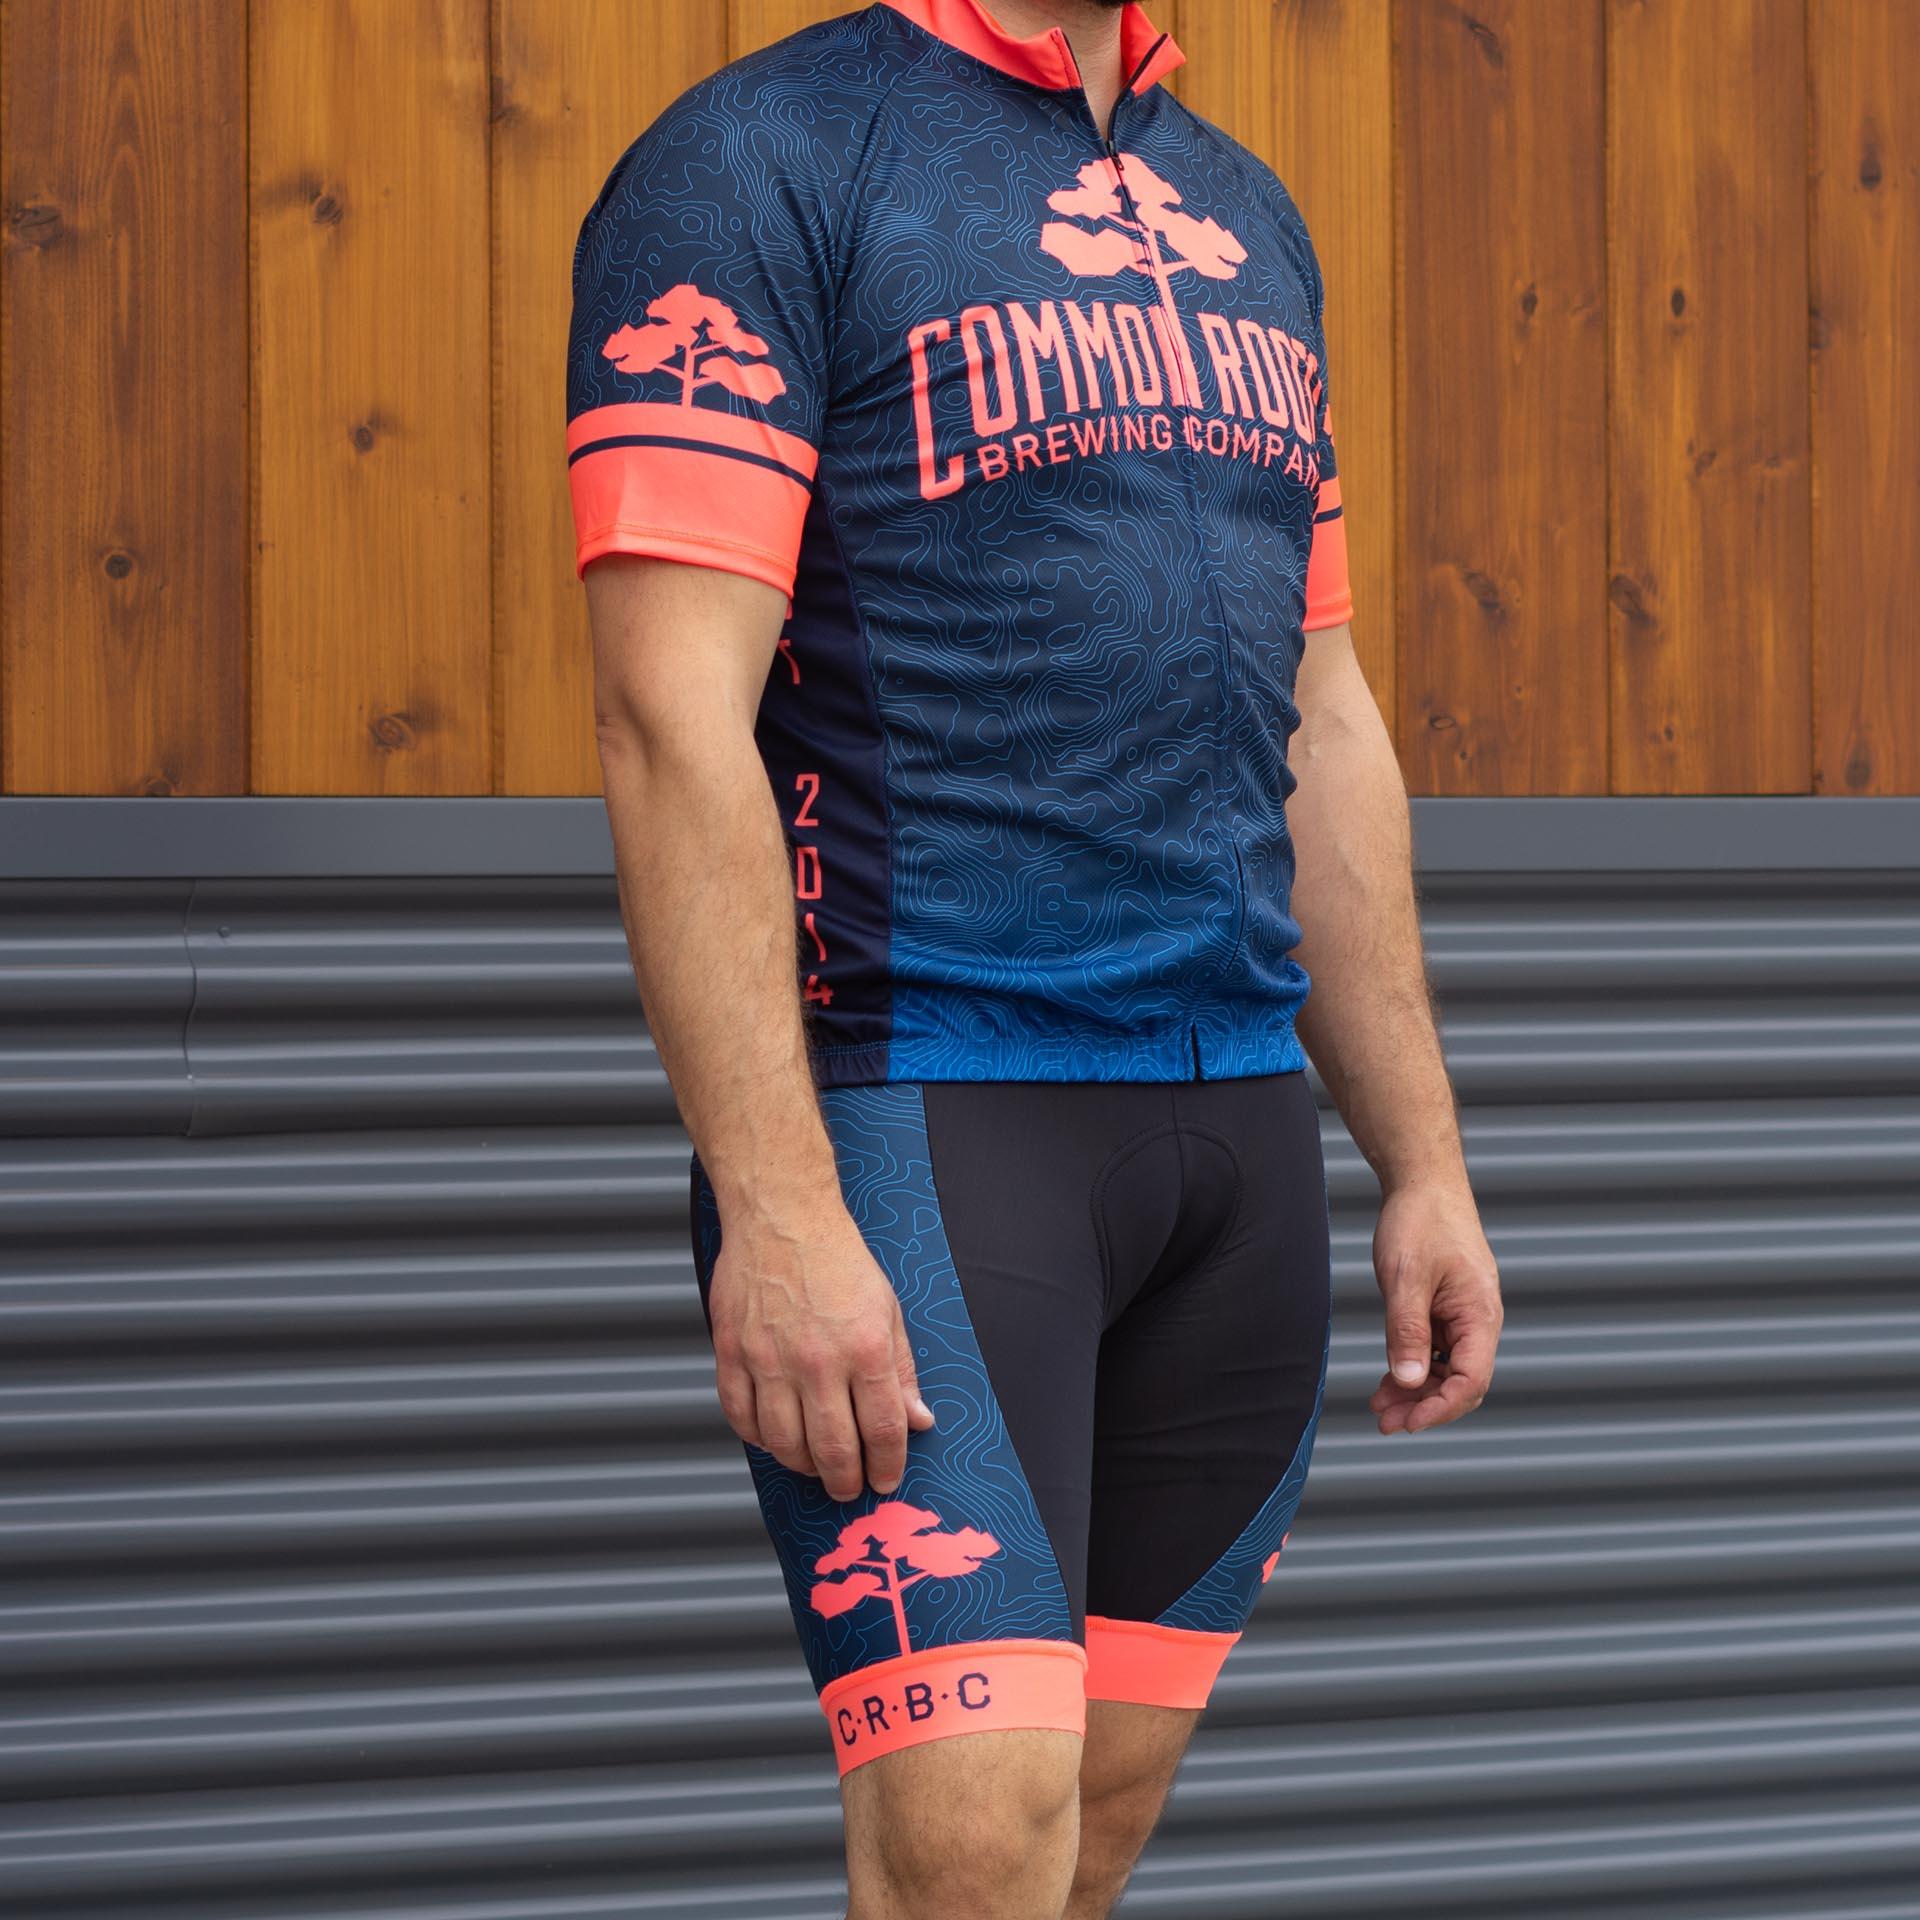 Bike Jersey and Bike Shorts Duo